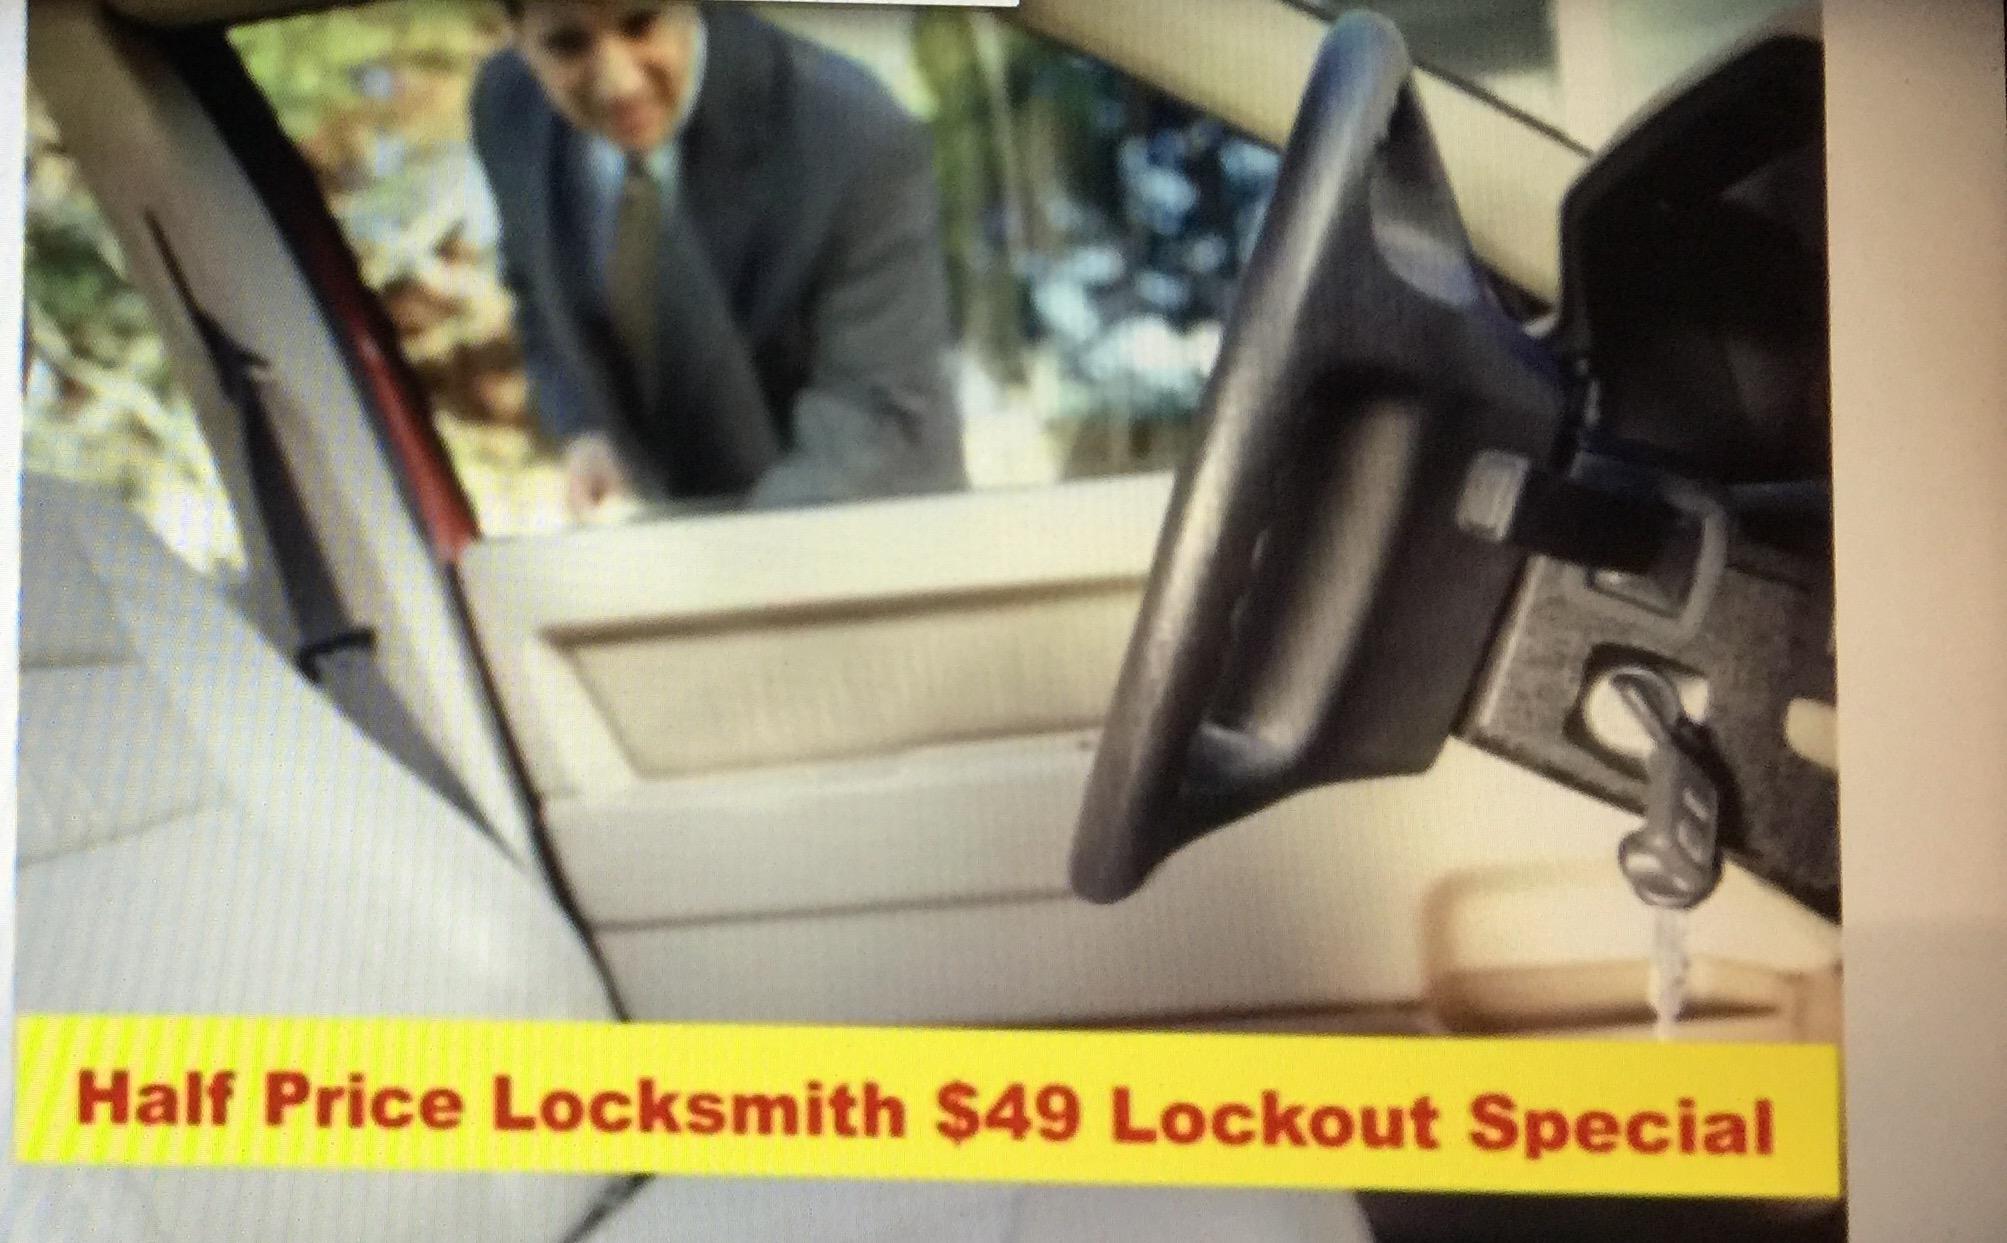 Half Price Locksmith image 23